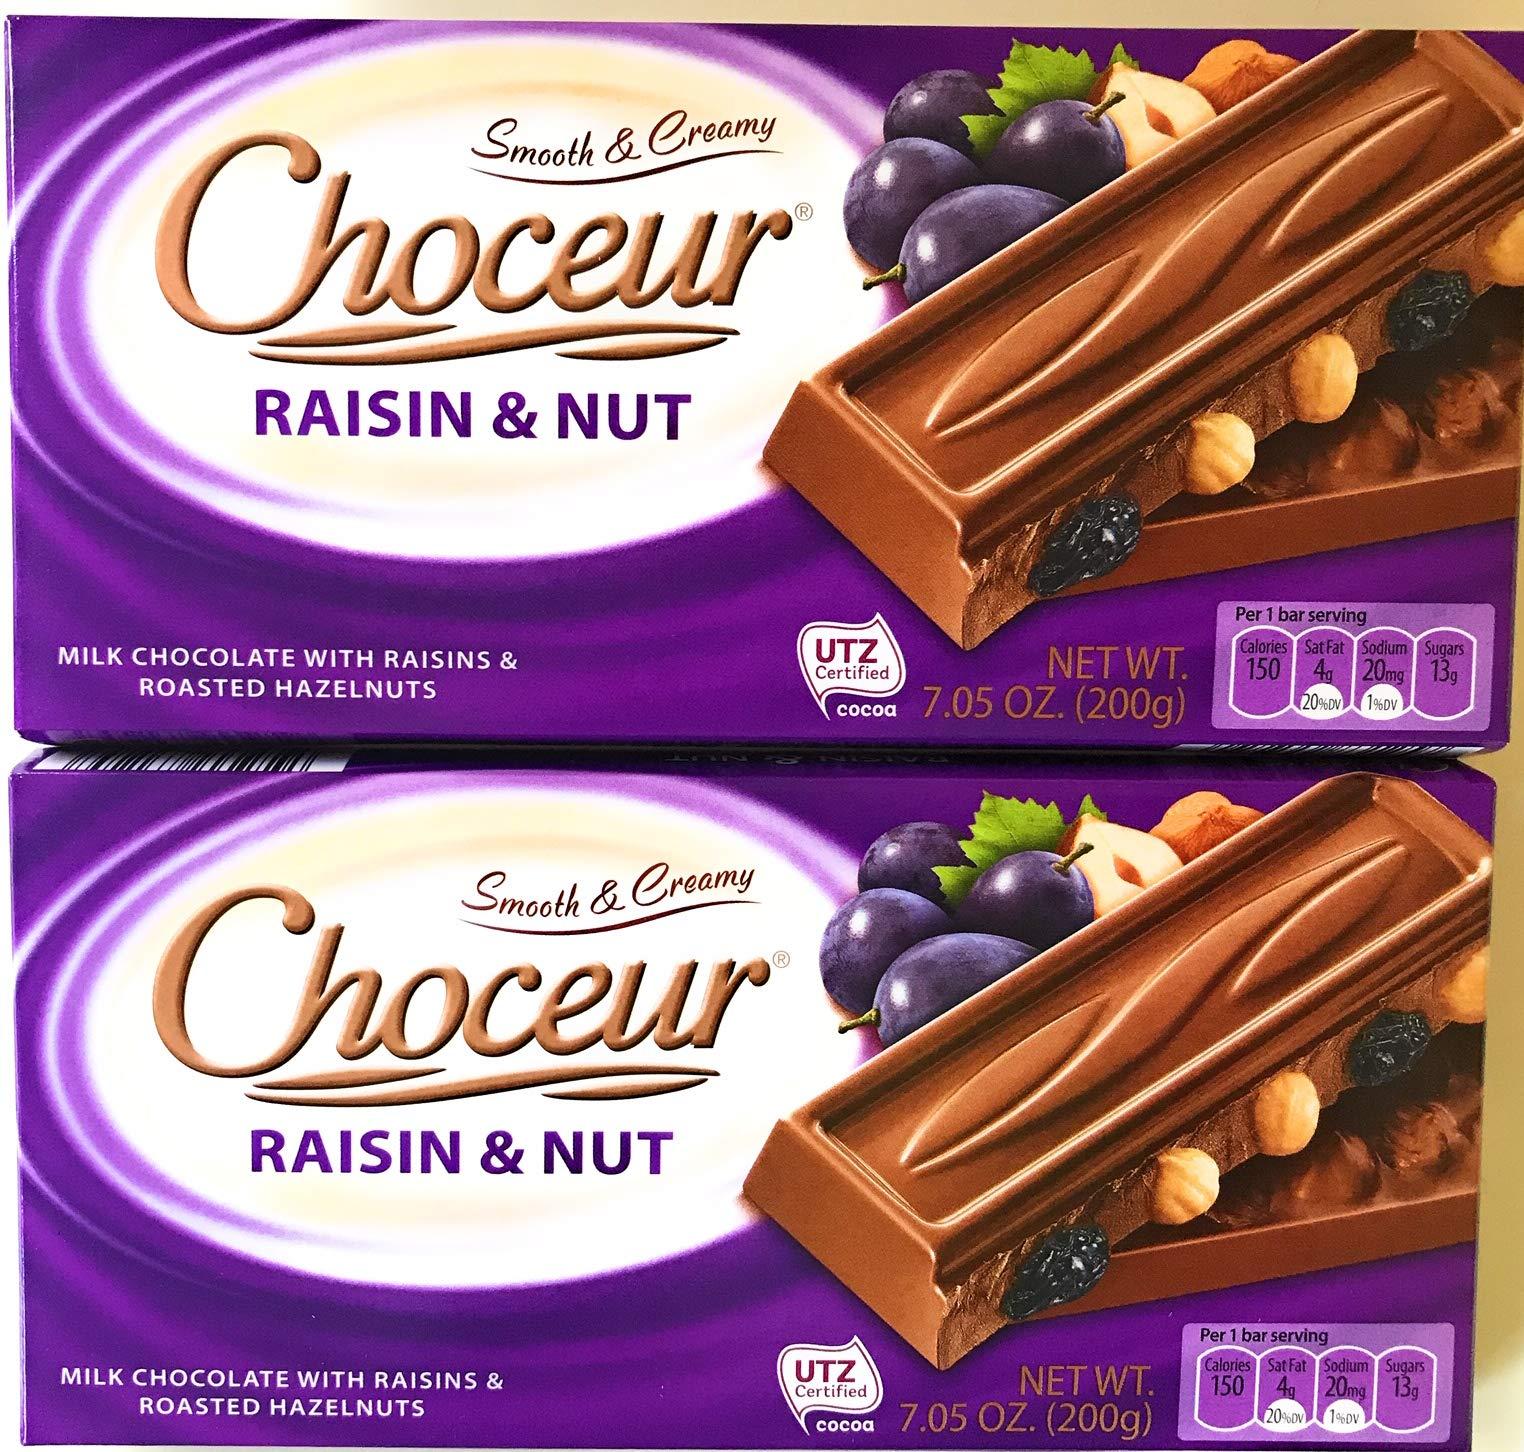 Choceur Raisin & Nut Milk Chocolate With Raisins & Roasted Hazelnuts 7.5 oz (200 g) (Pack of 2)